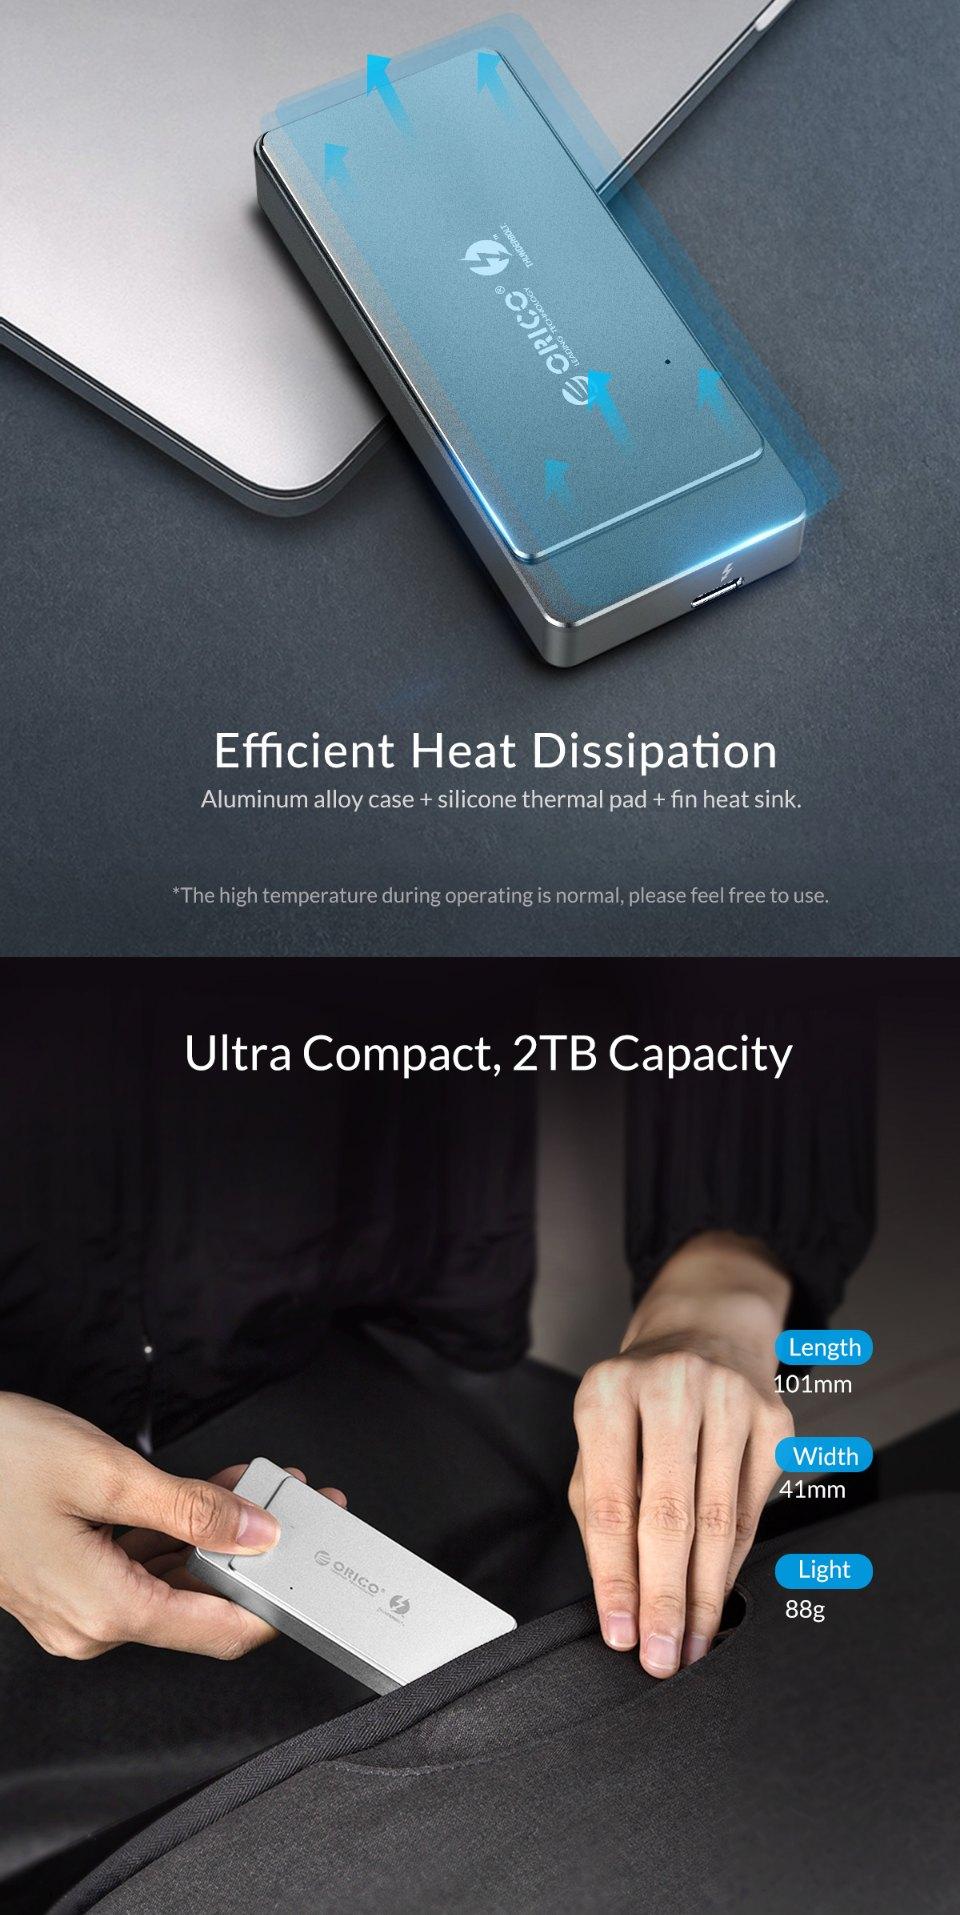 Orico Thunderbolt 3 M.2 NVME Enclosure Silver features 3